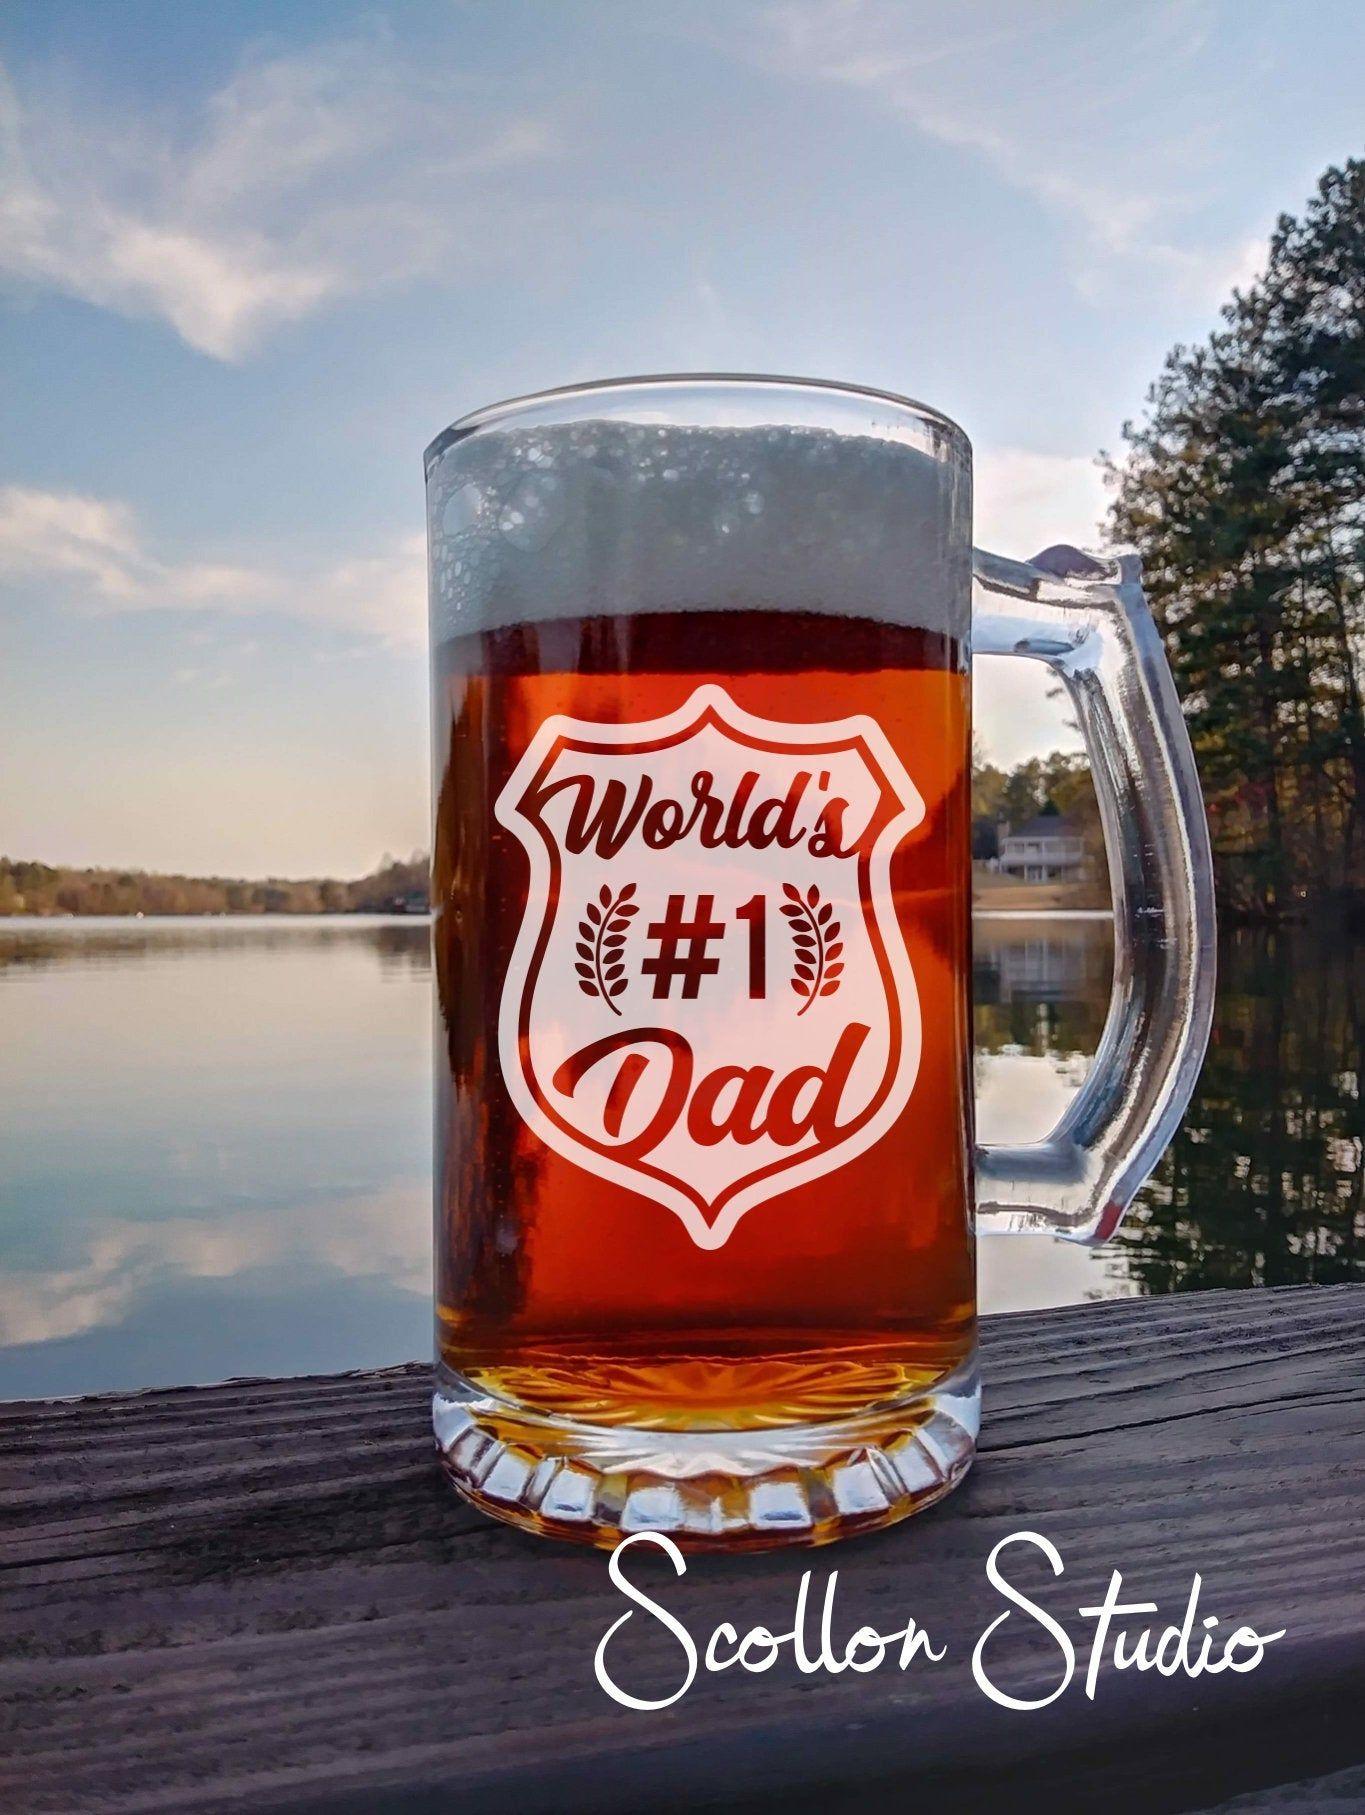 World S 1 Dad Beer Mug Beer Gift Police Gifts Etsy In 2020 Beer Gifts Firemen Gifts Beer